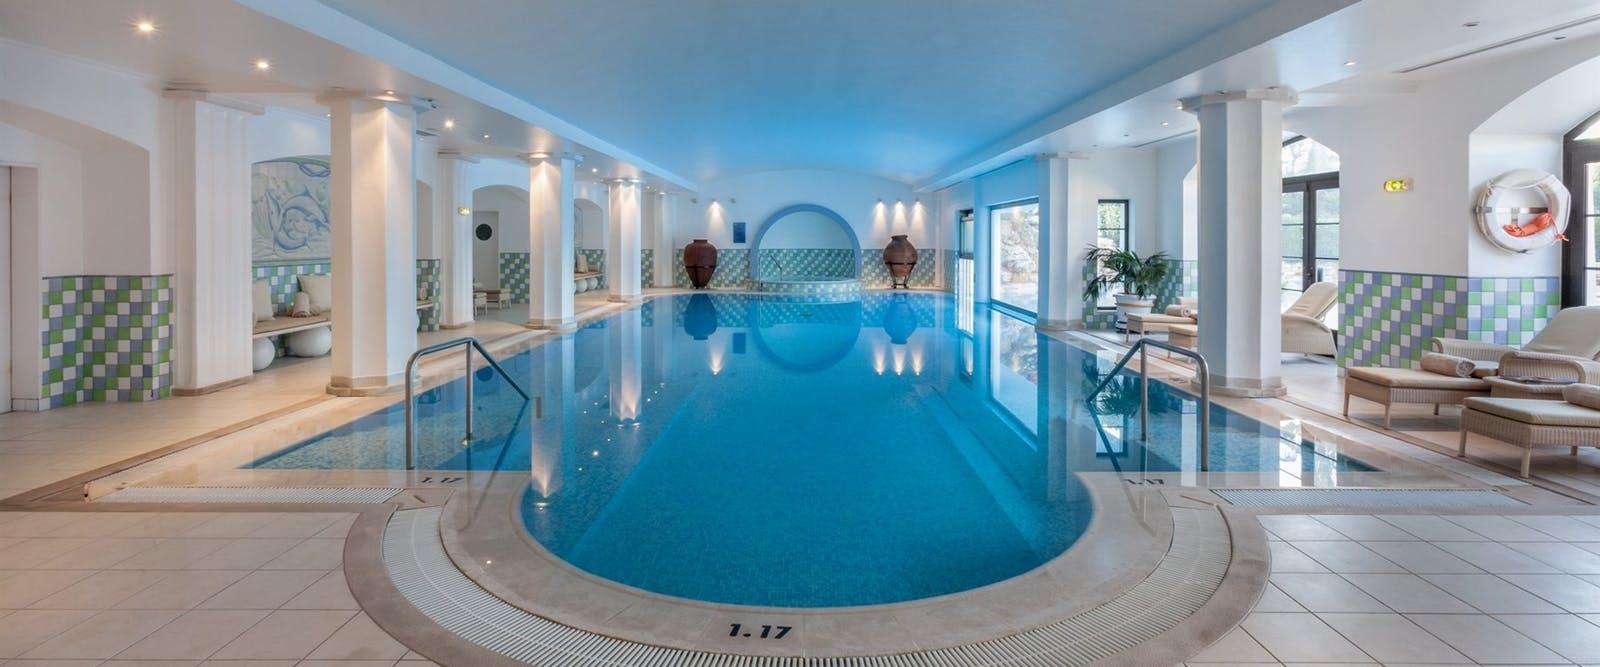 vila-vita-parc-spa-pool